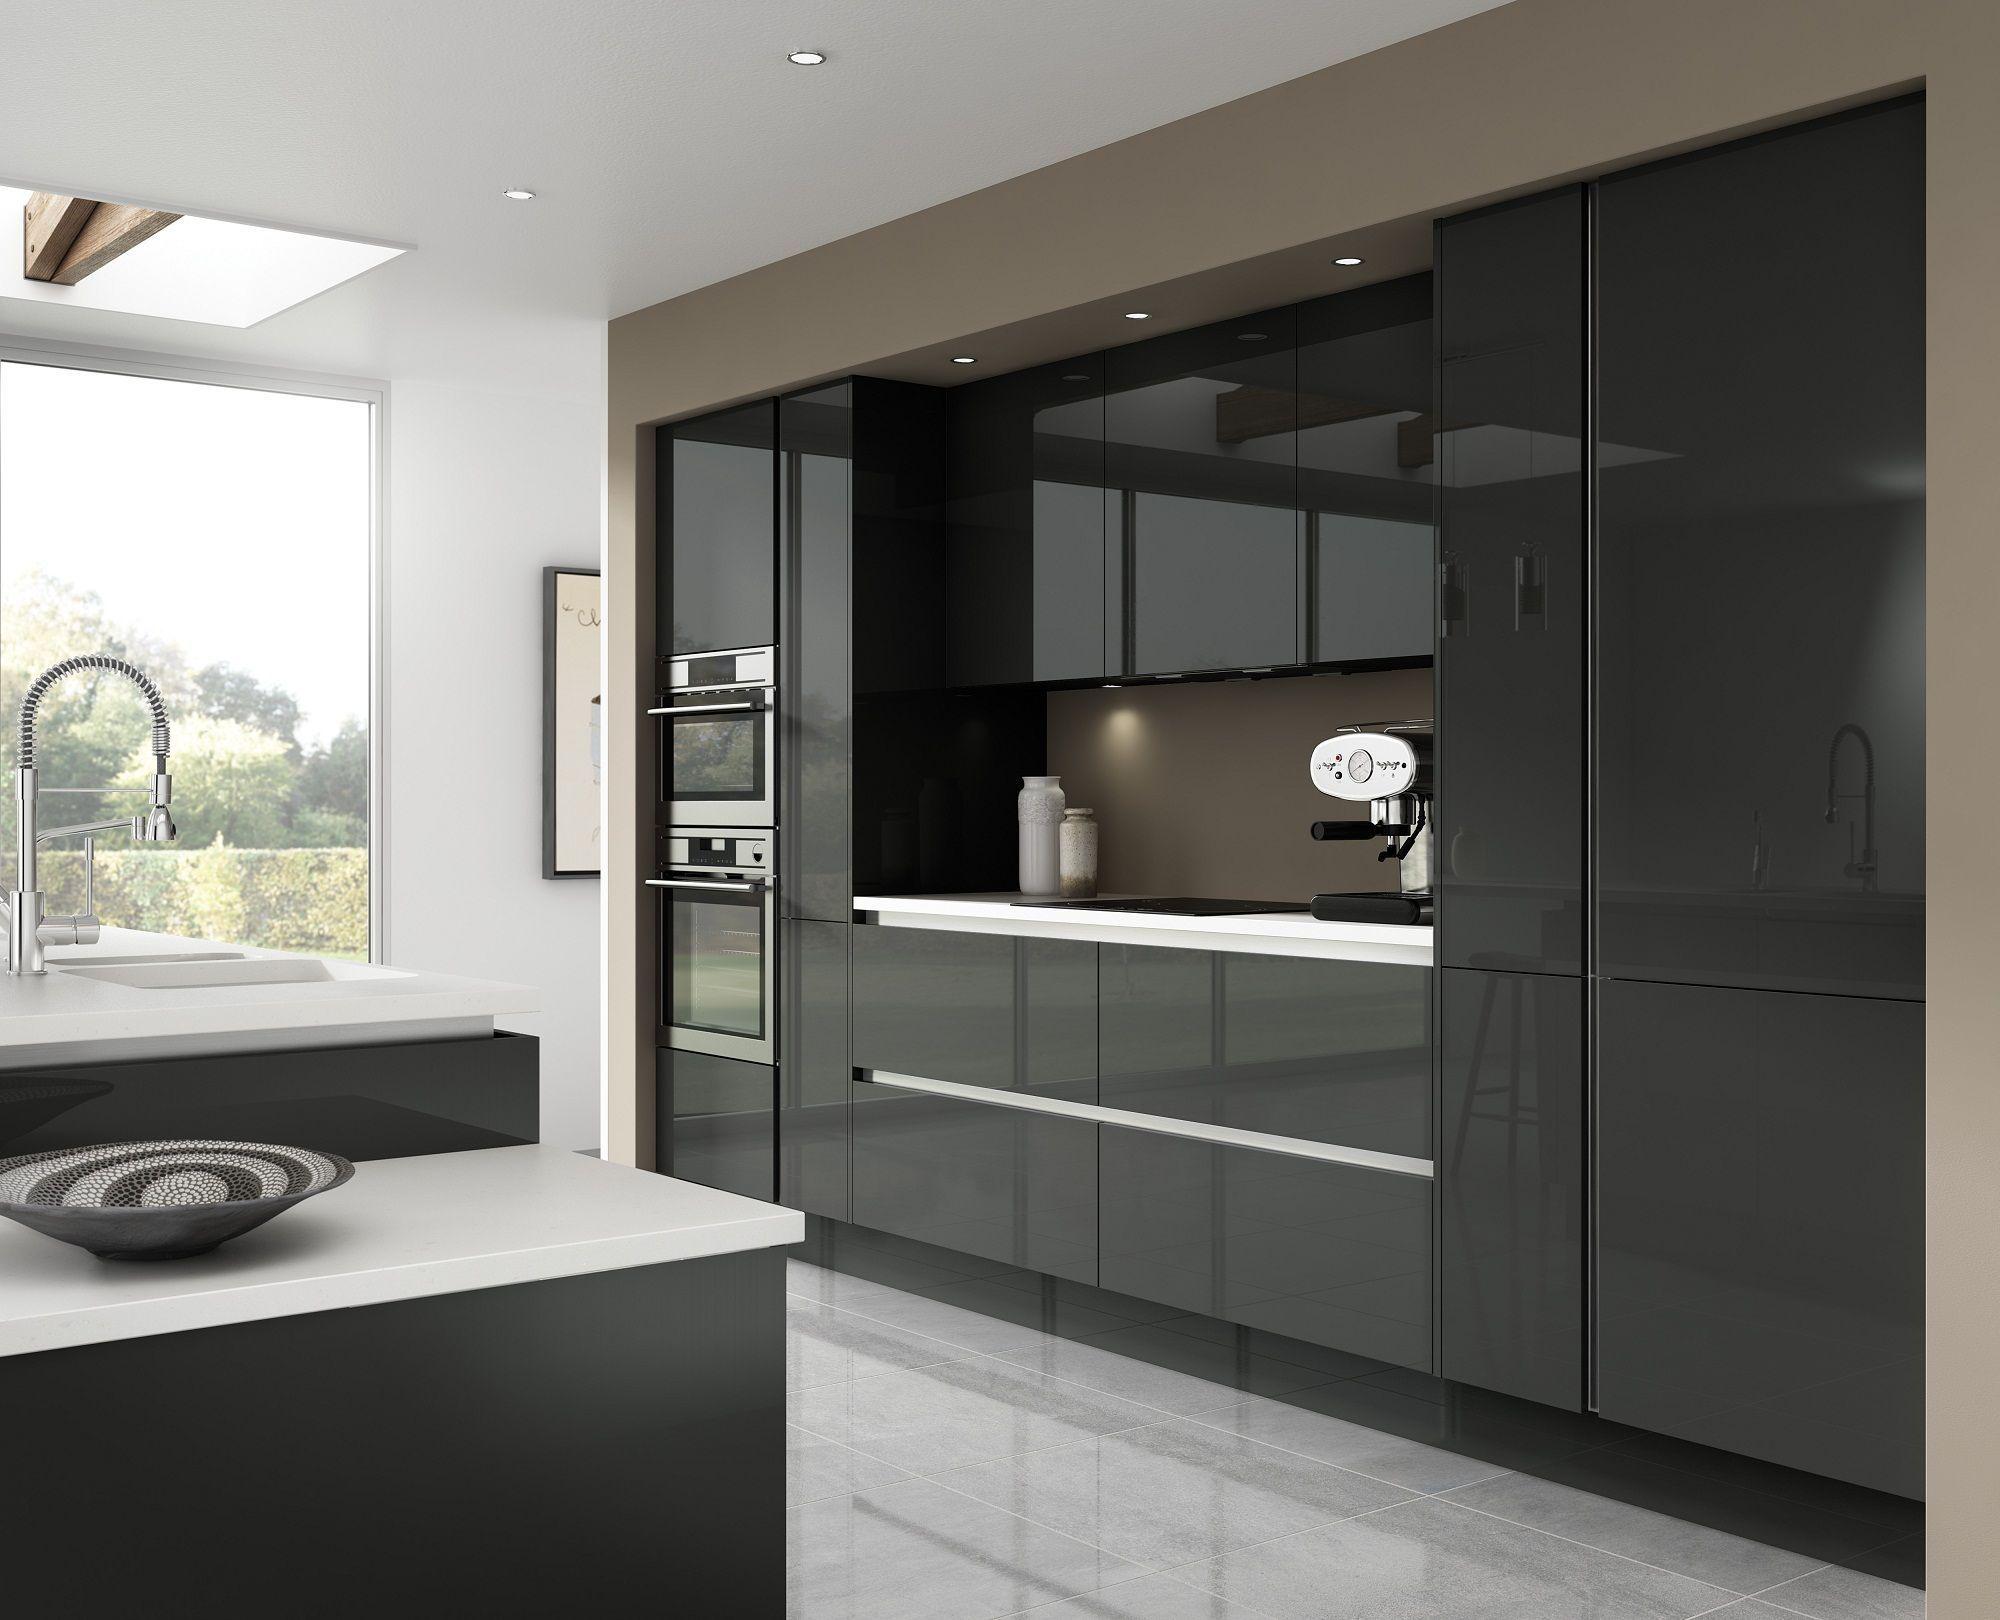 Luna Gloss Dark Grey Really Shows Off A Stylish Modern Kitchen